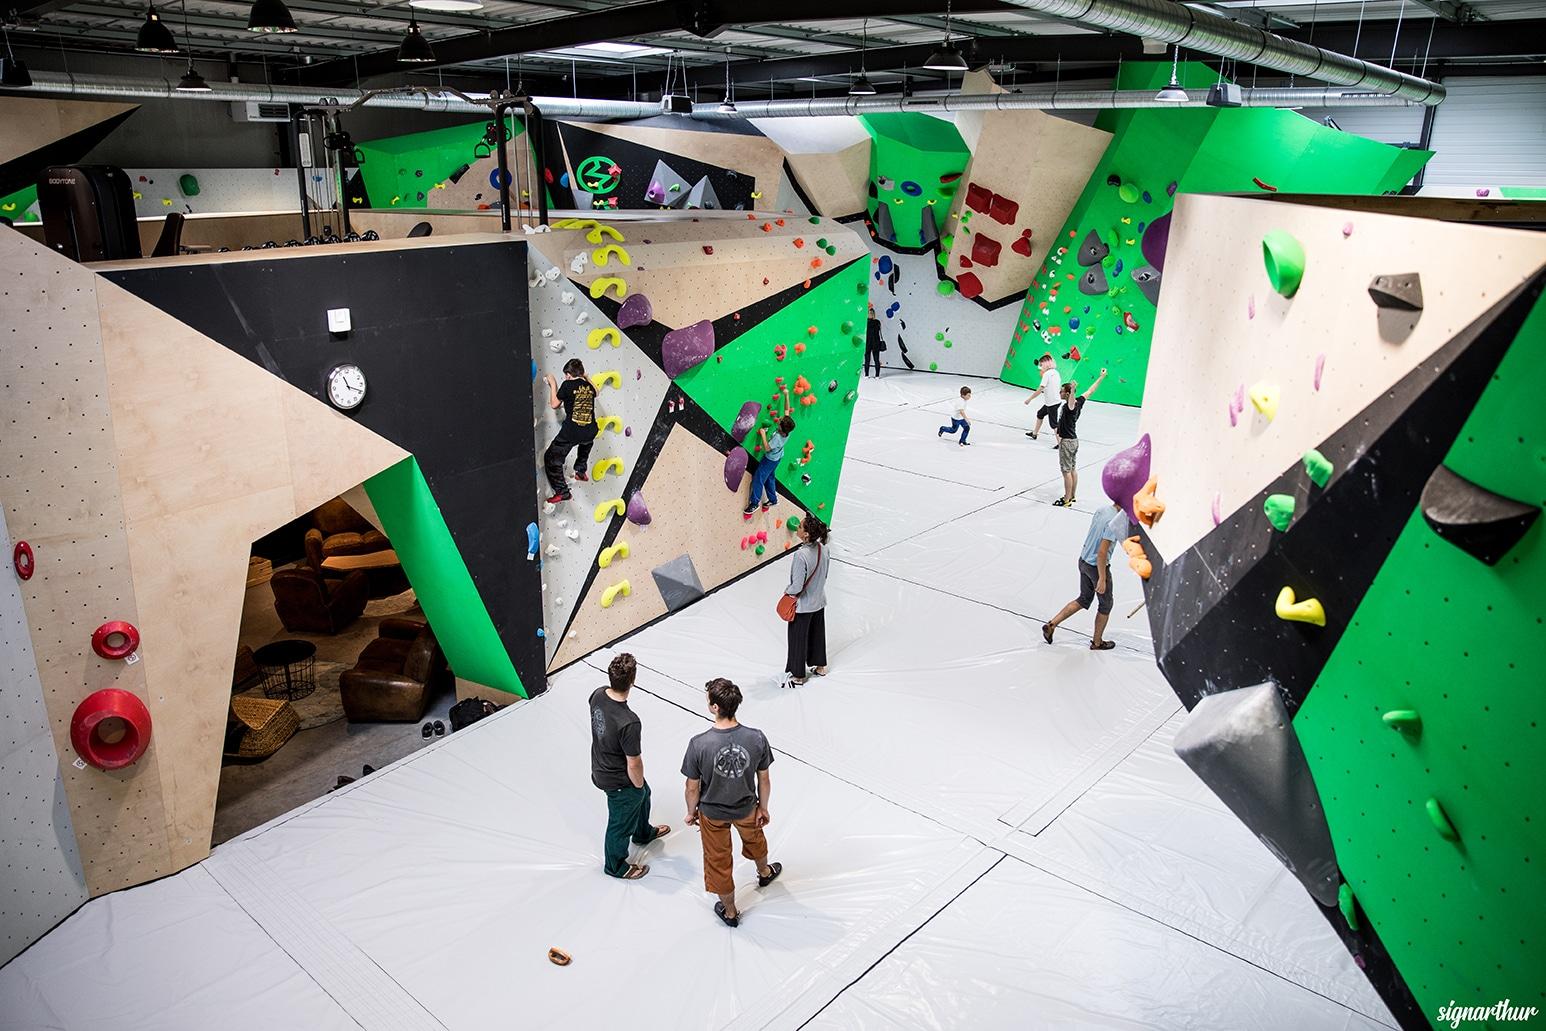 salle d'escalade en Sartre - Le Mans - indoor - restaurant et bar